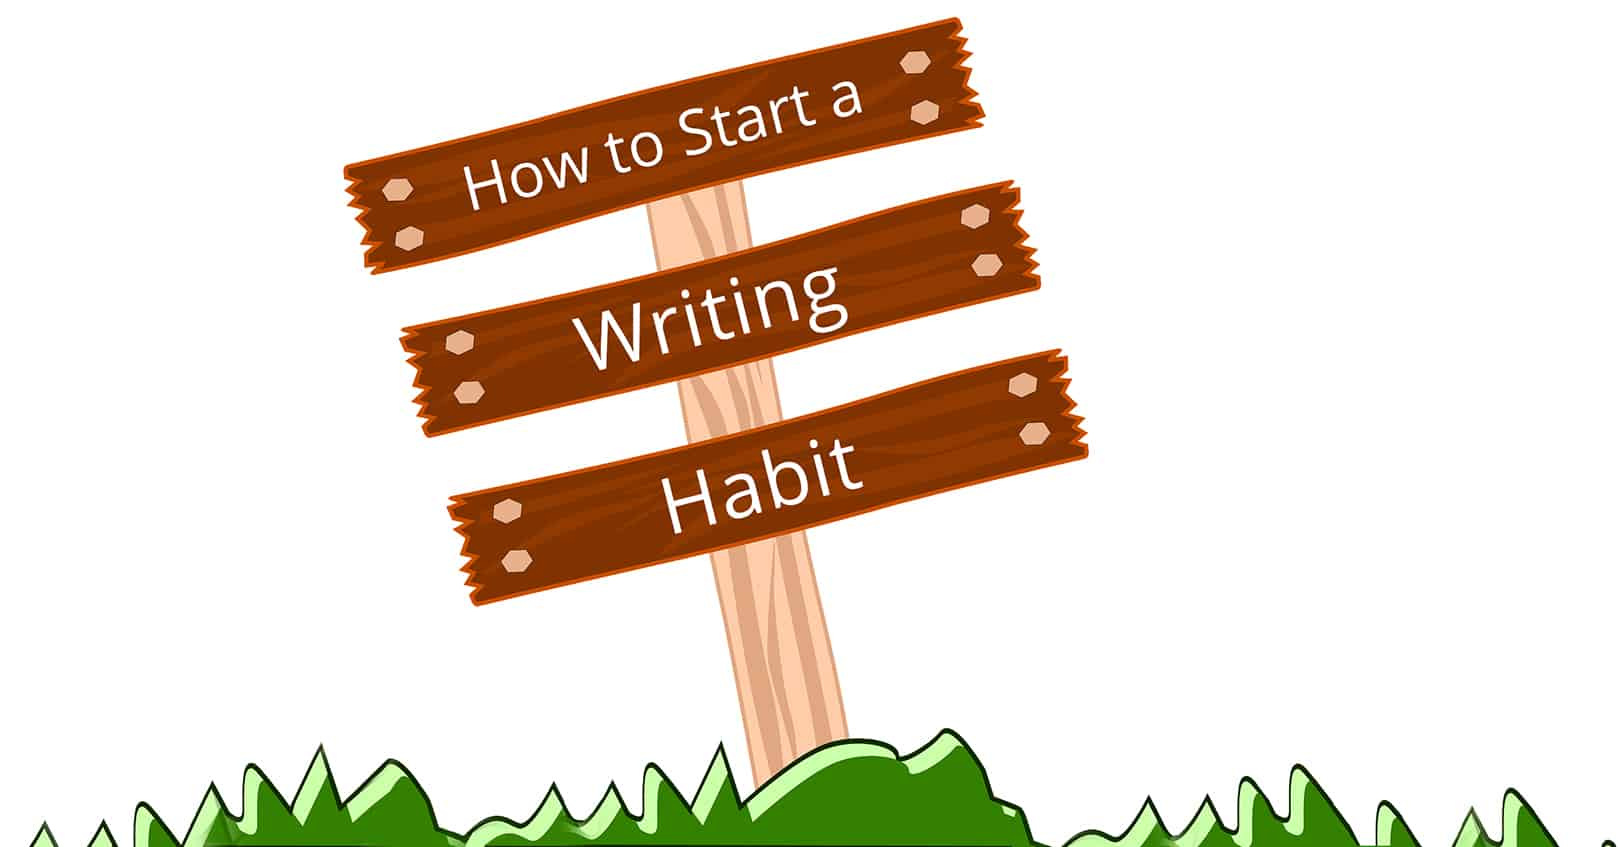 start a writing habit